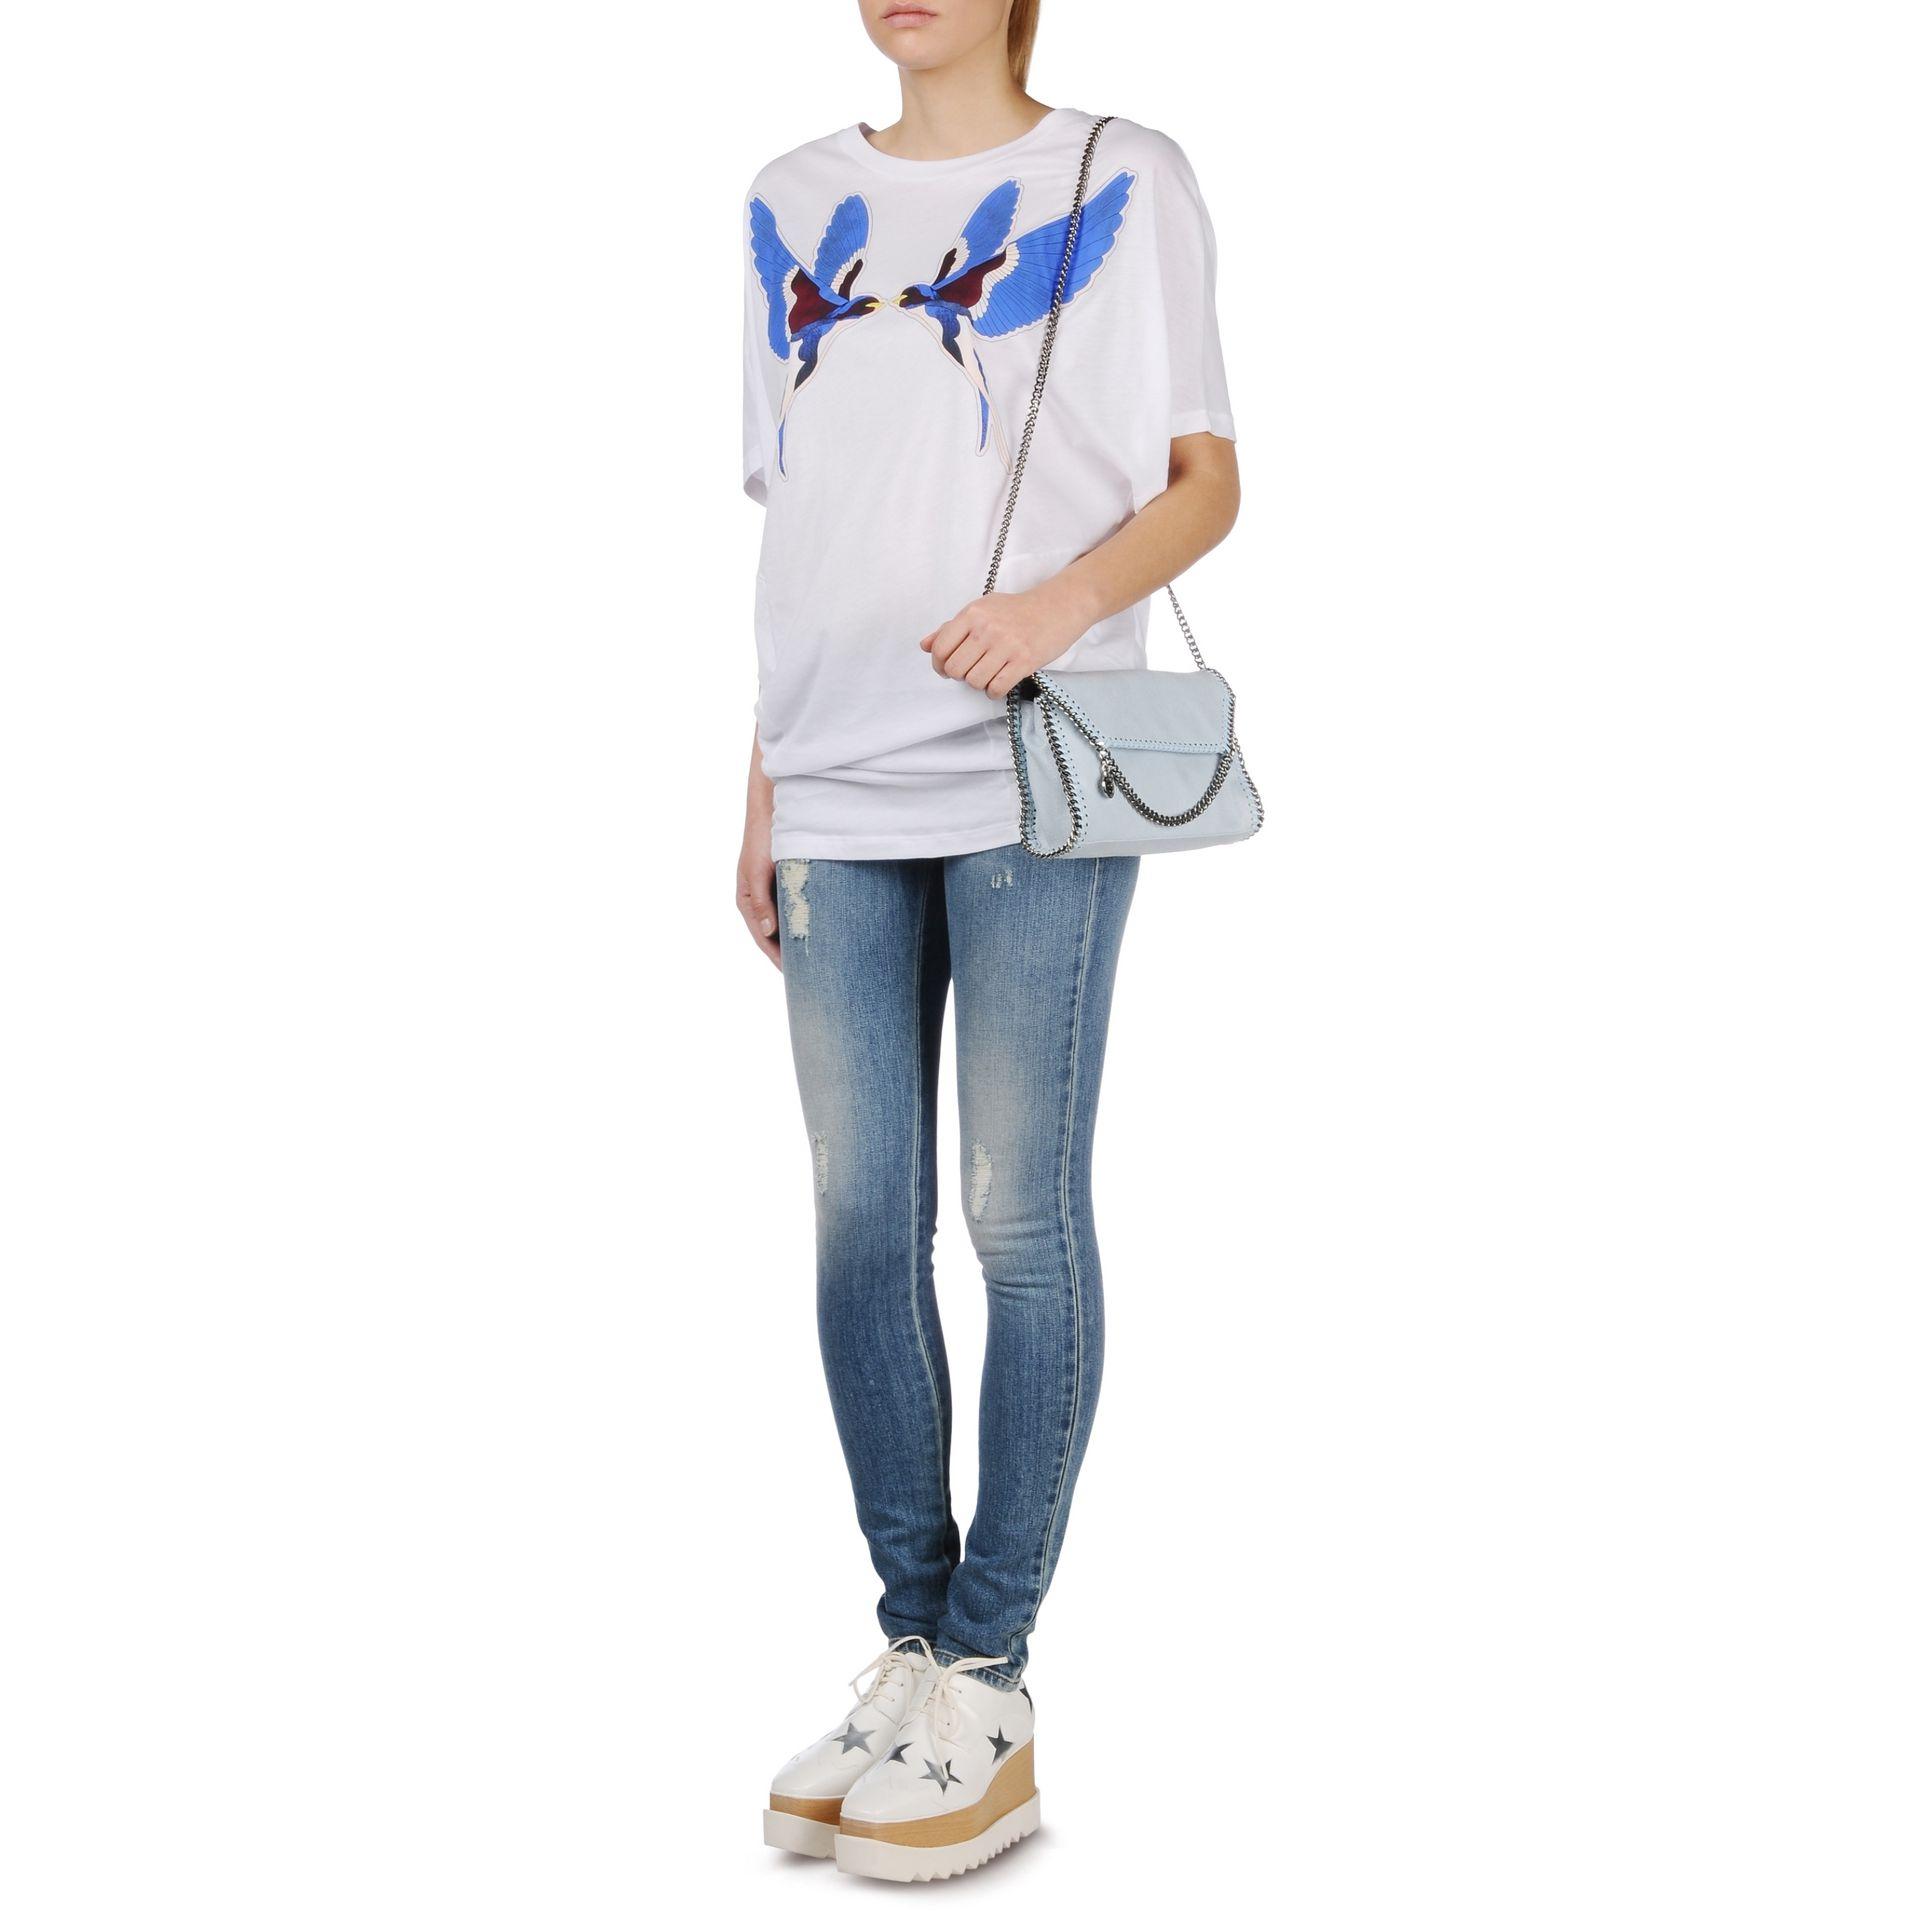 43aa75a35ce1 Lyst - Stella McCartney Falabella Shaggy Deer Mini Bag in Blue